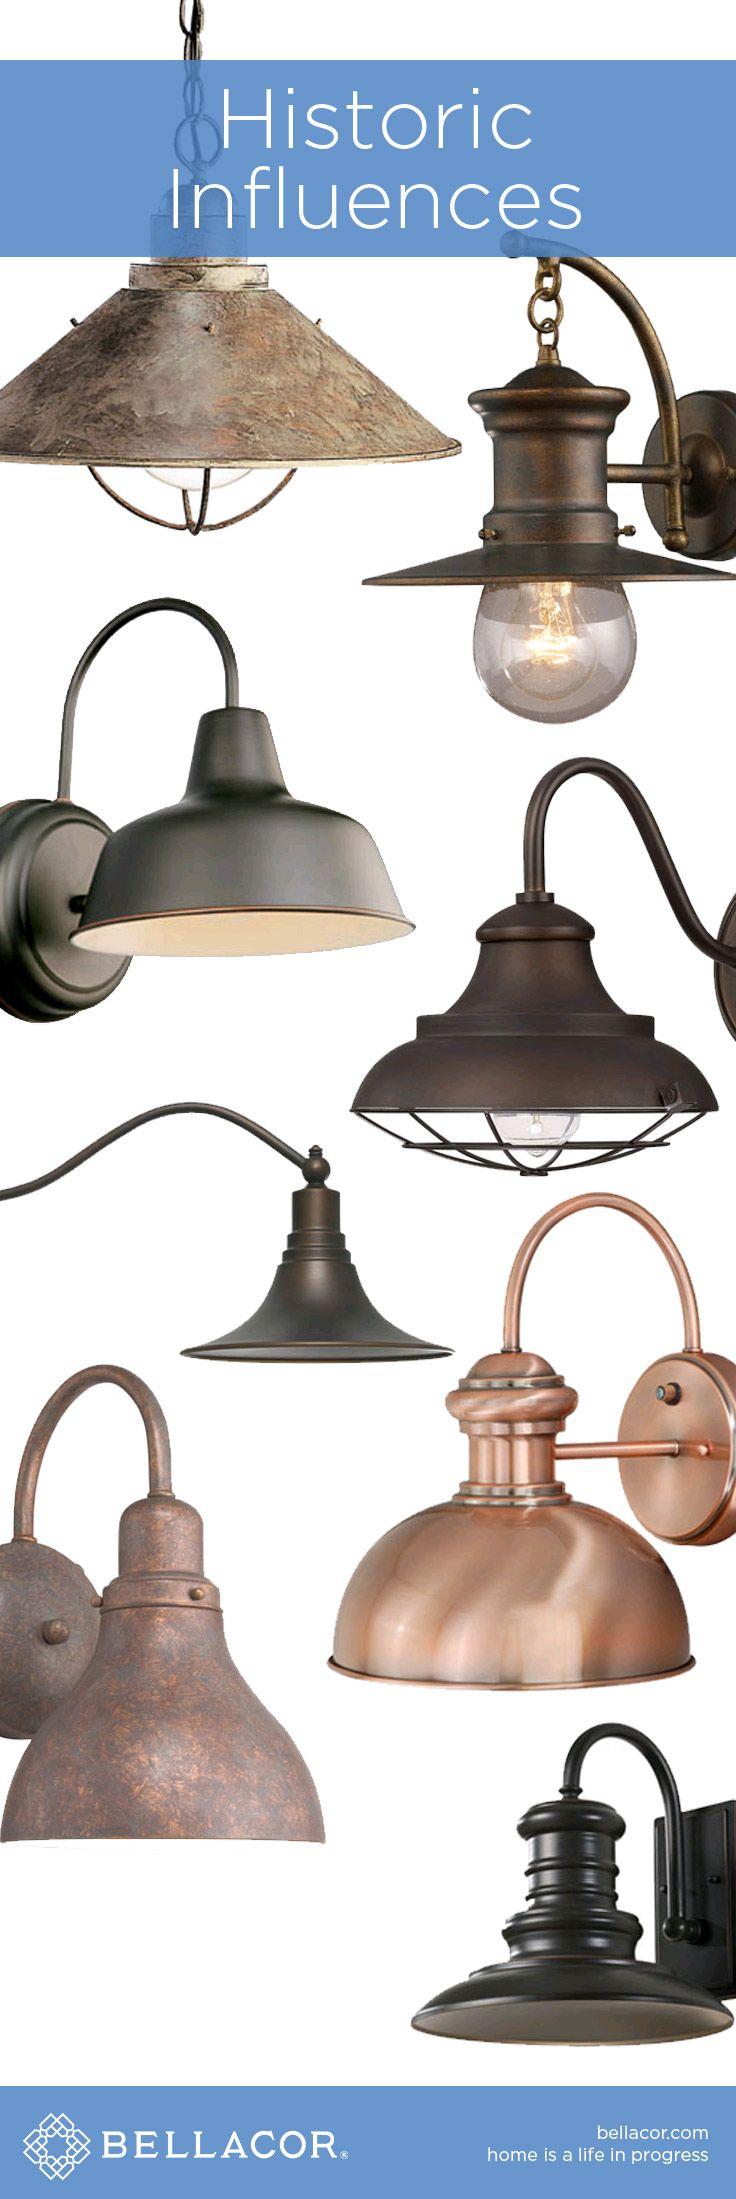 Historic Influences on Lighting at http://www.bellacor.com/